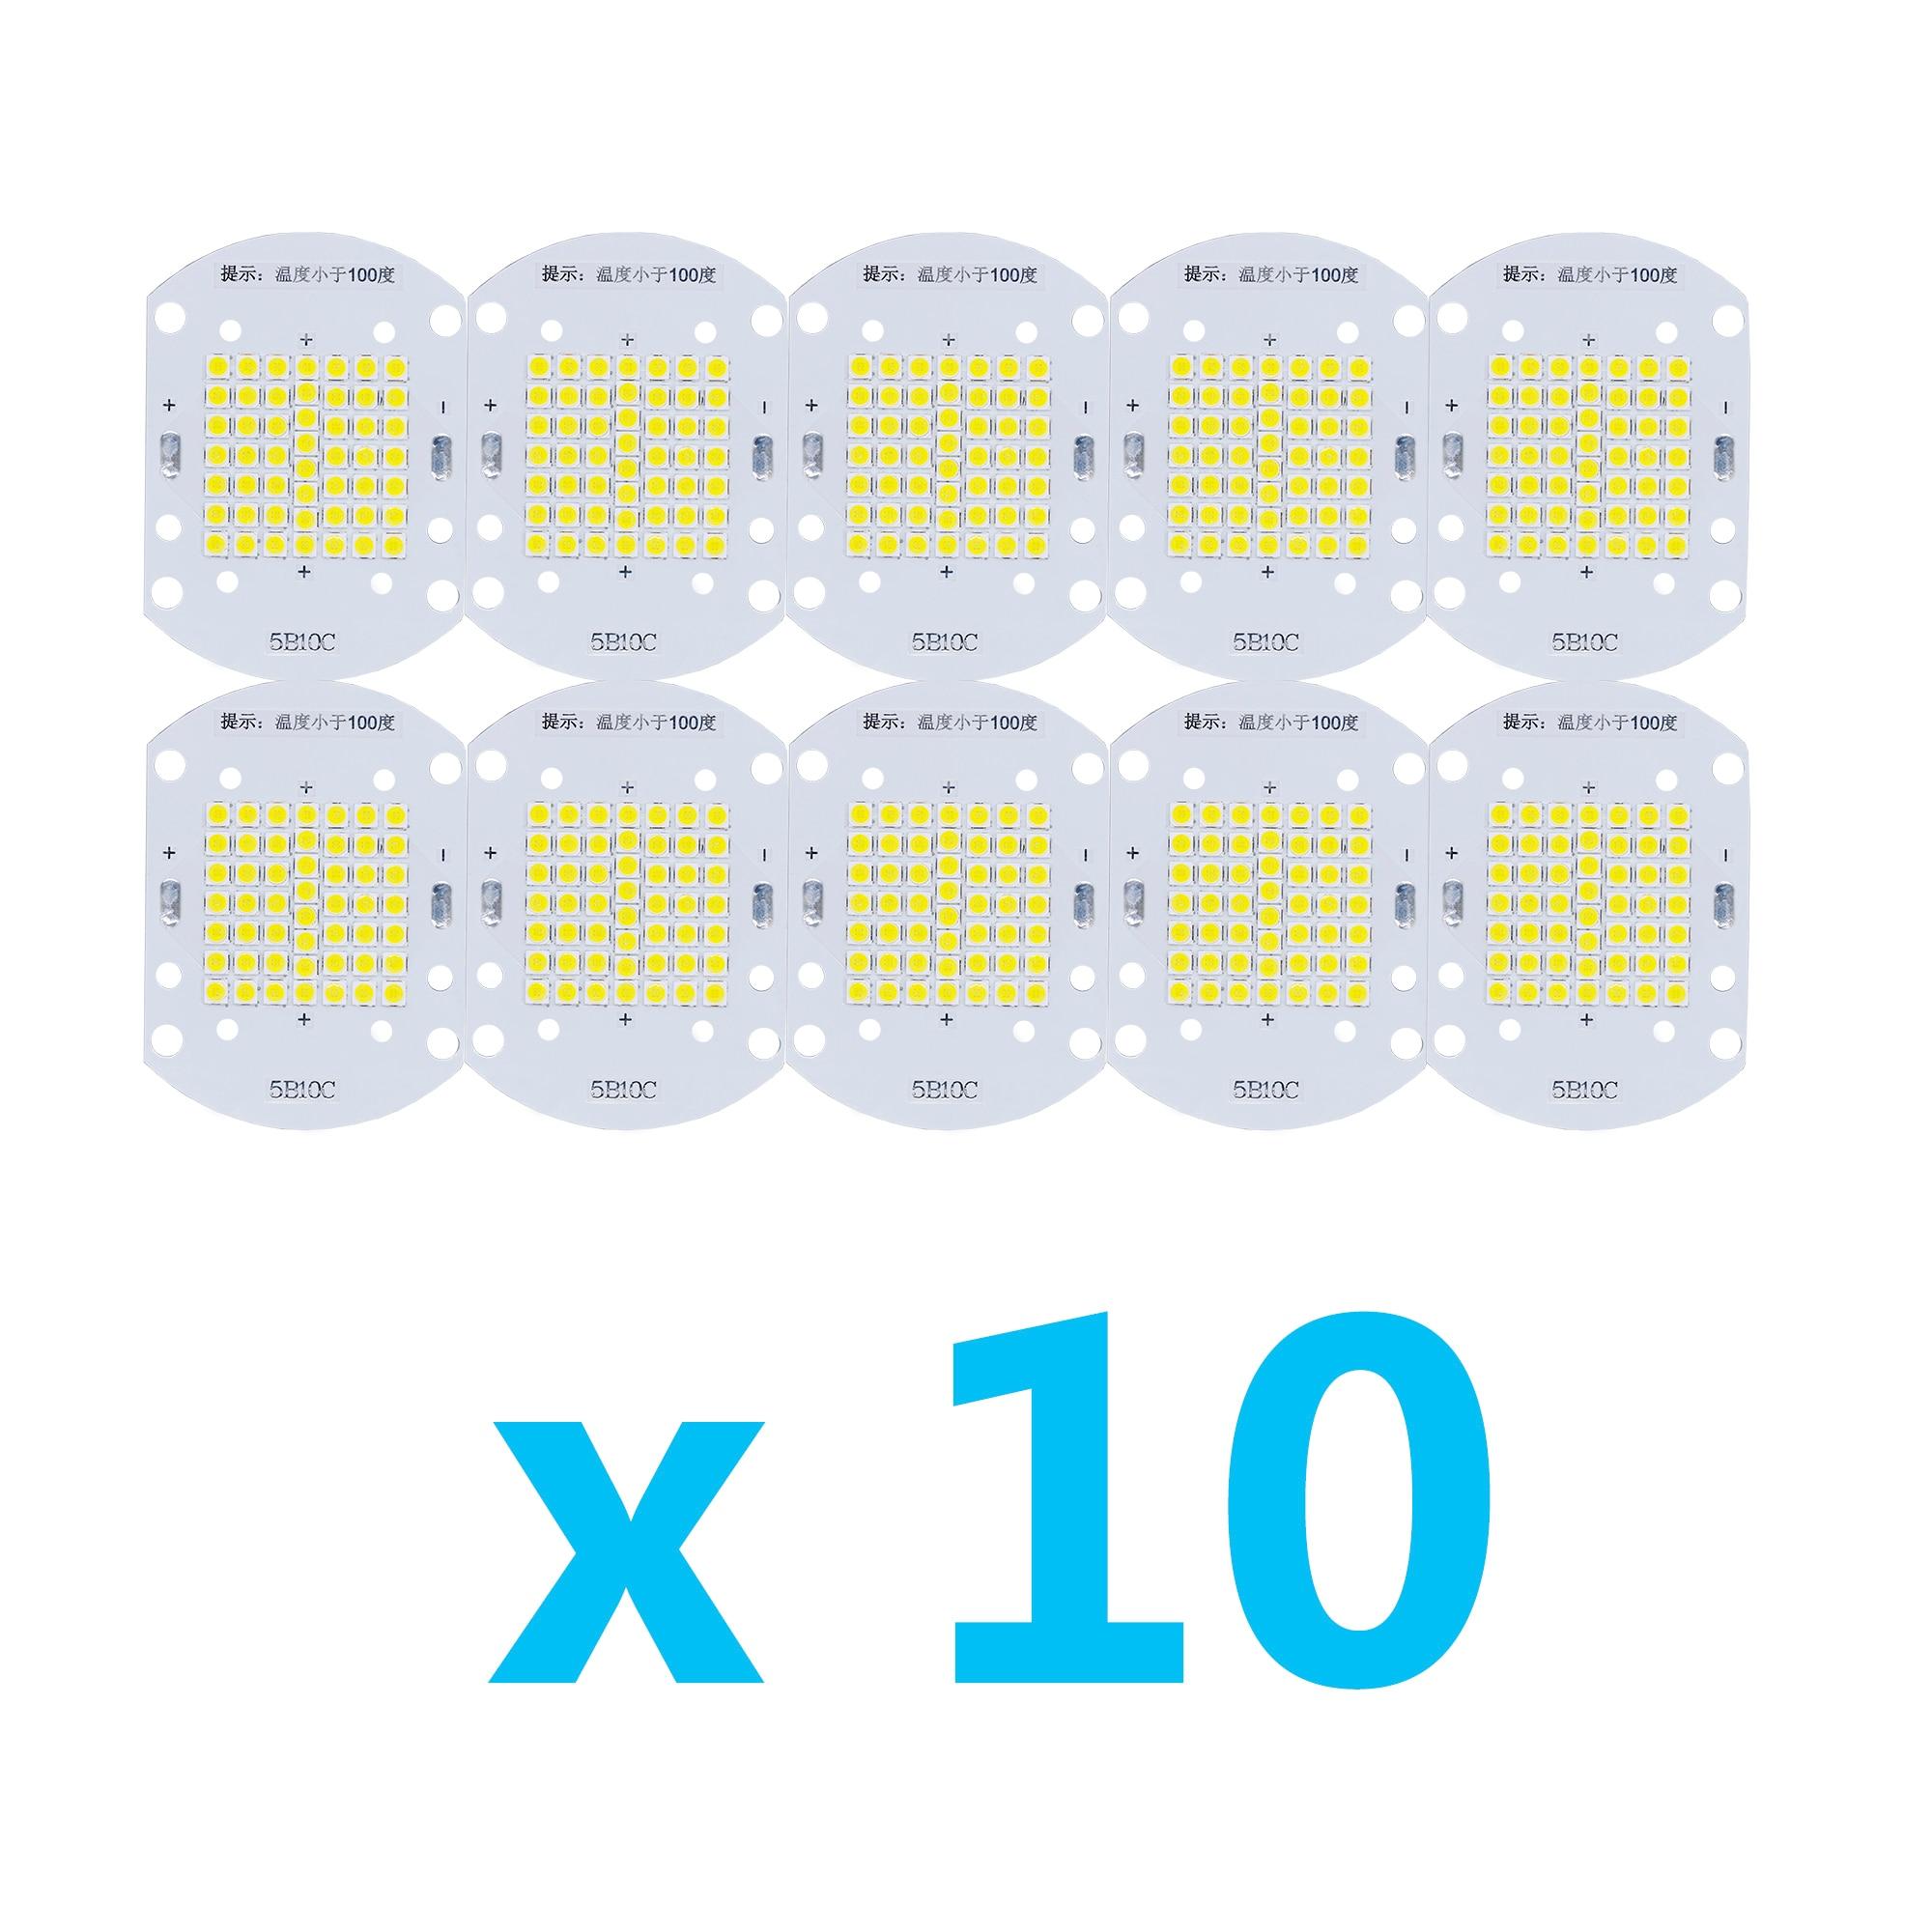 10 Uds. Mucho de alta potencia 50W LED Bombilla 3030SMD Chip blanco 30-34V lámpara para exterior Interior reflector para DIY LED